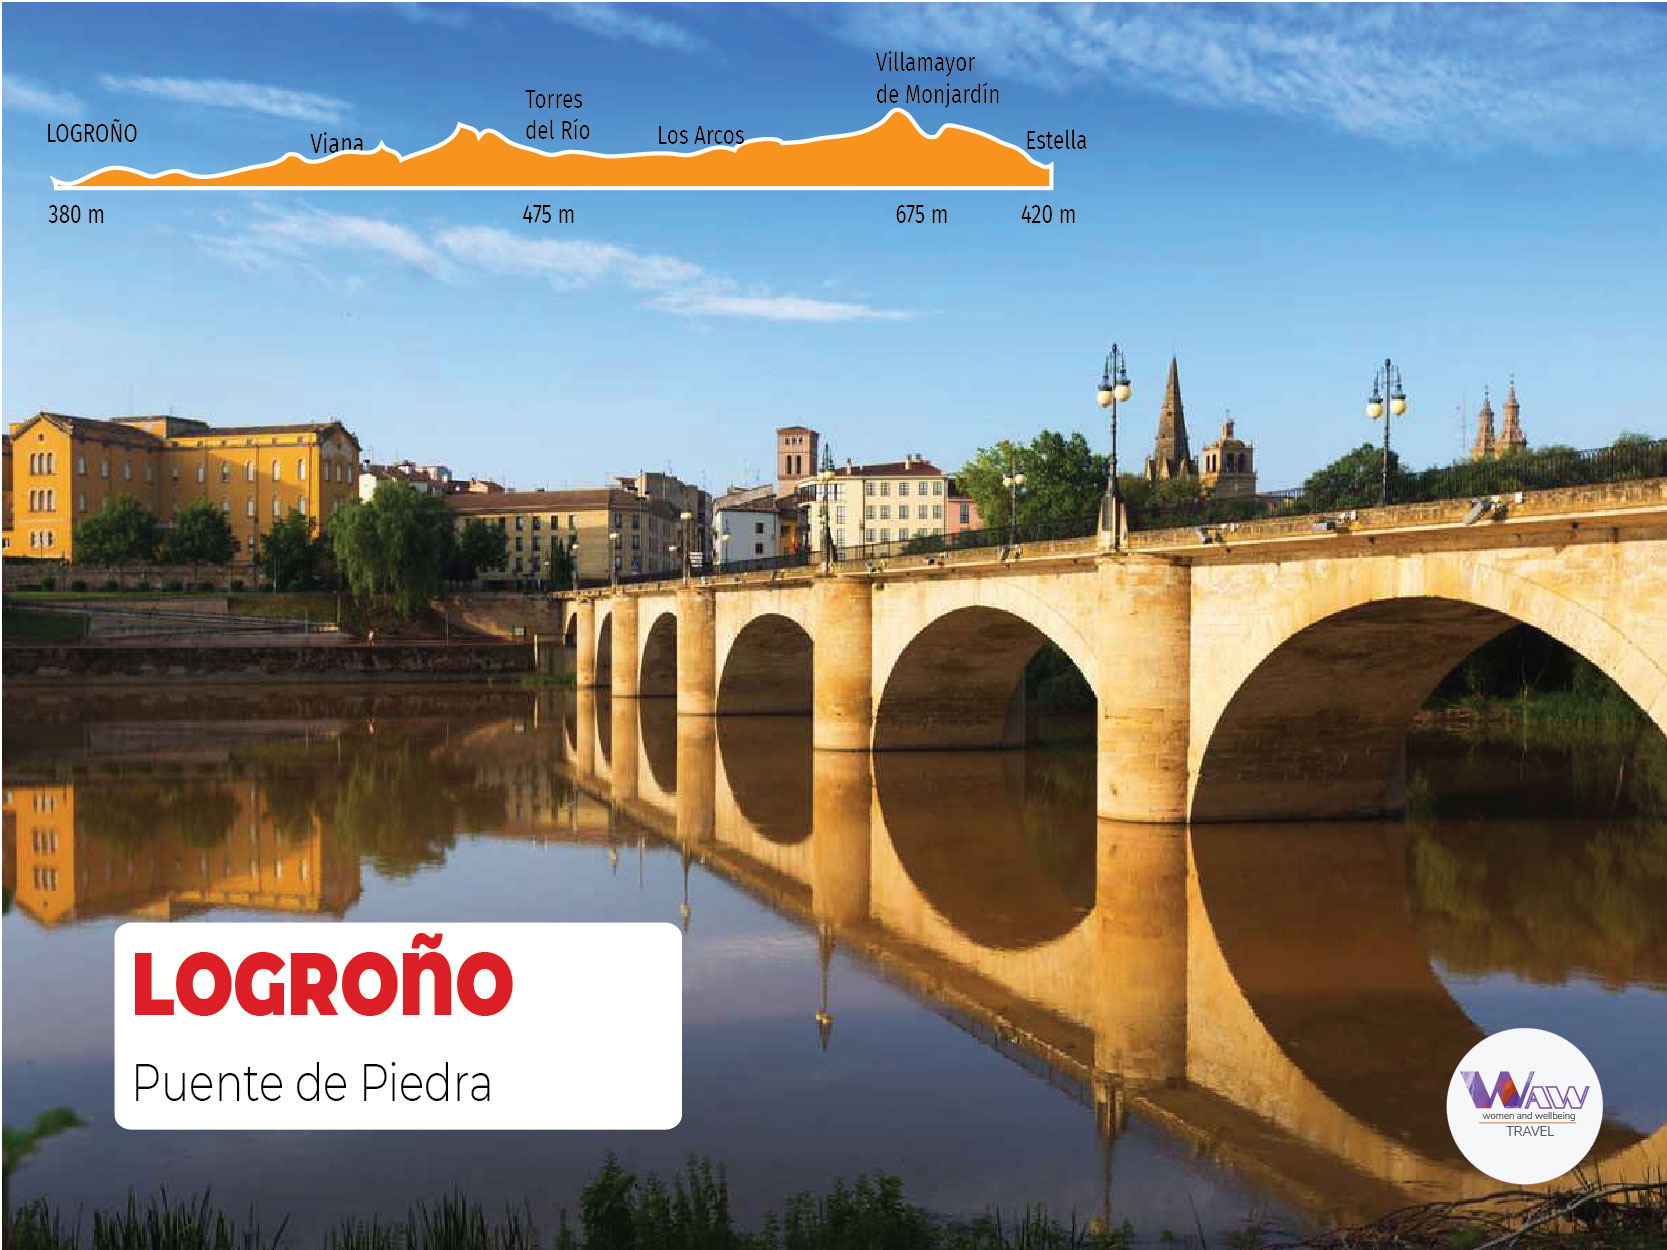 DAG 3 Etappe Estella-Logroño 48,2 km